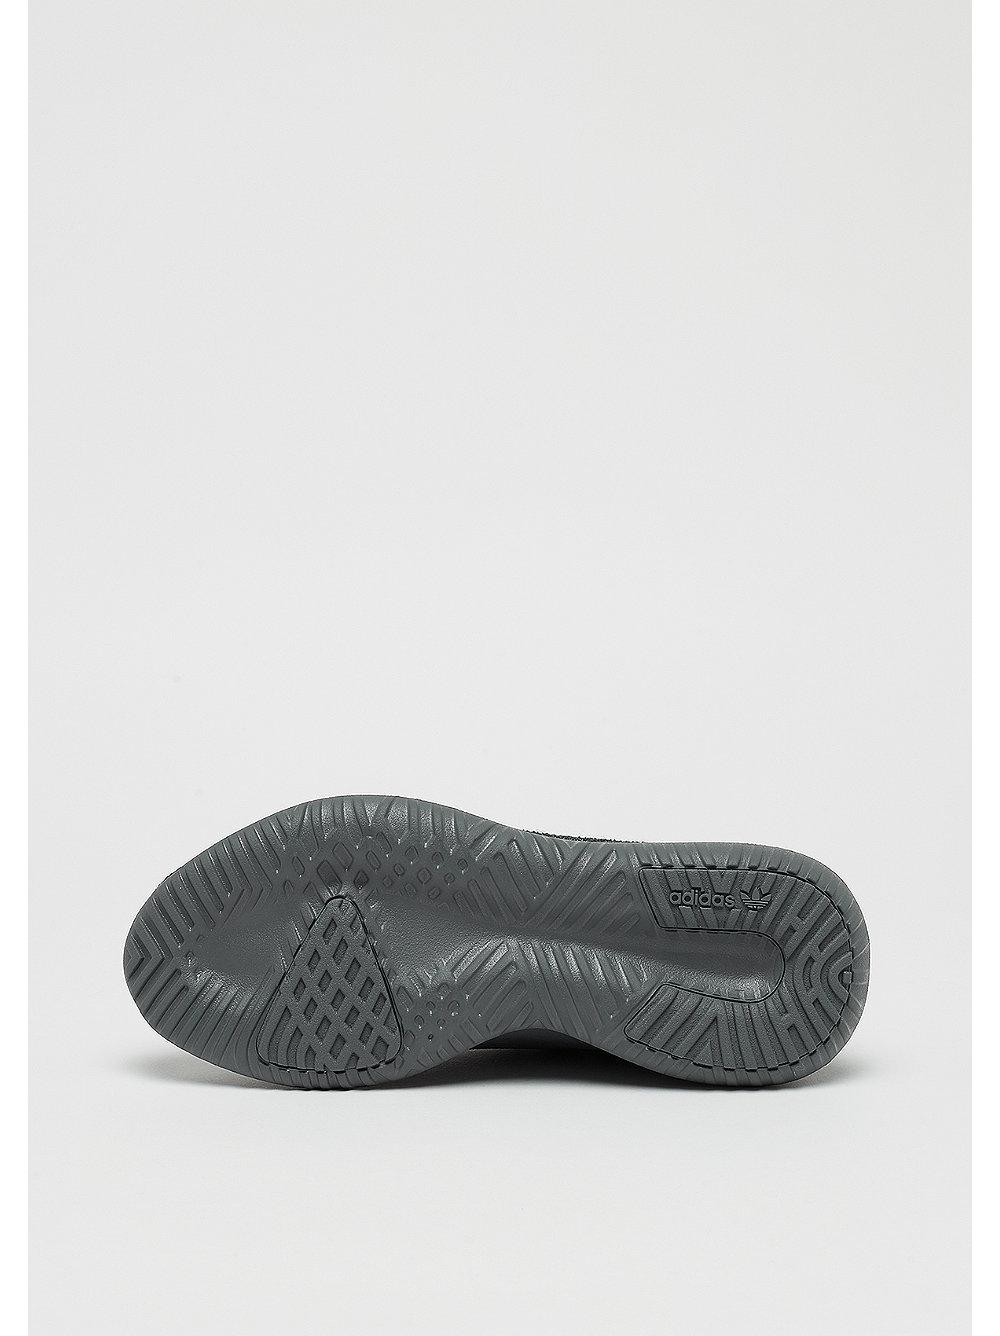 Adidas Tubular Shadow Grey Five Snipes Online Shop